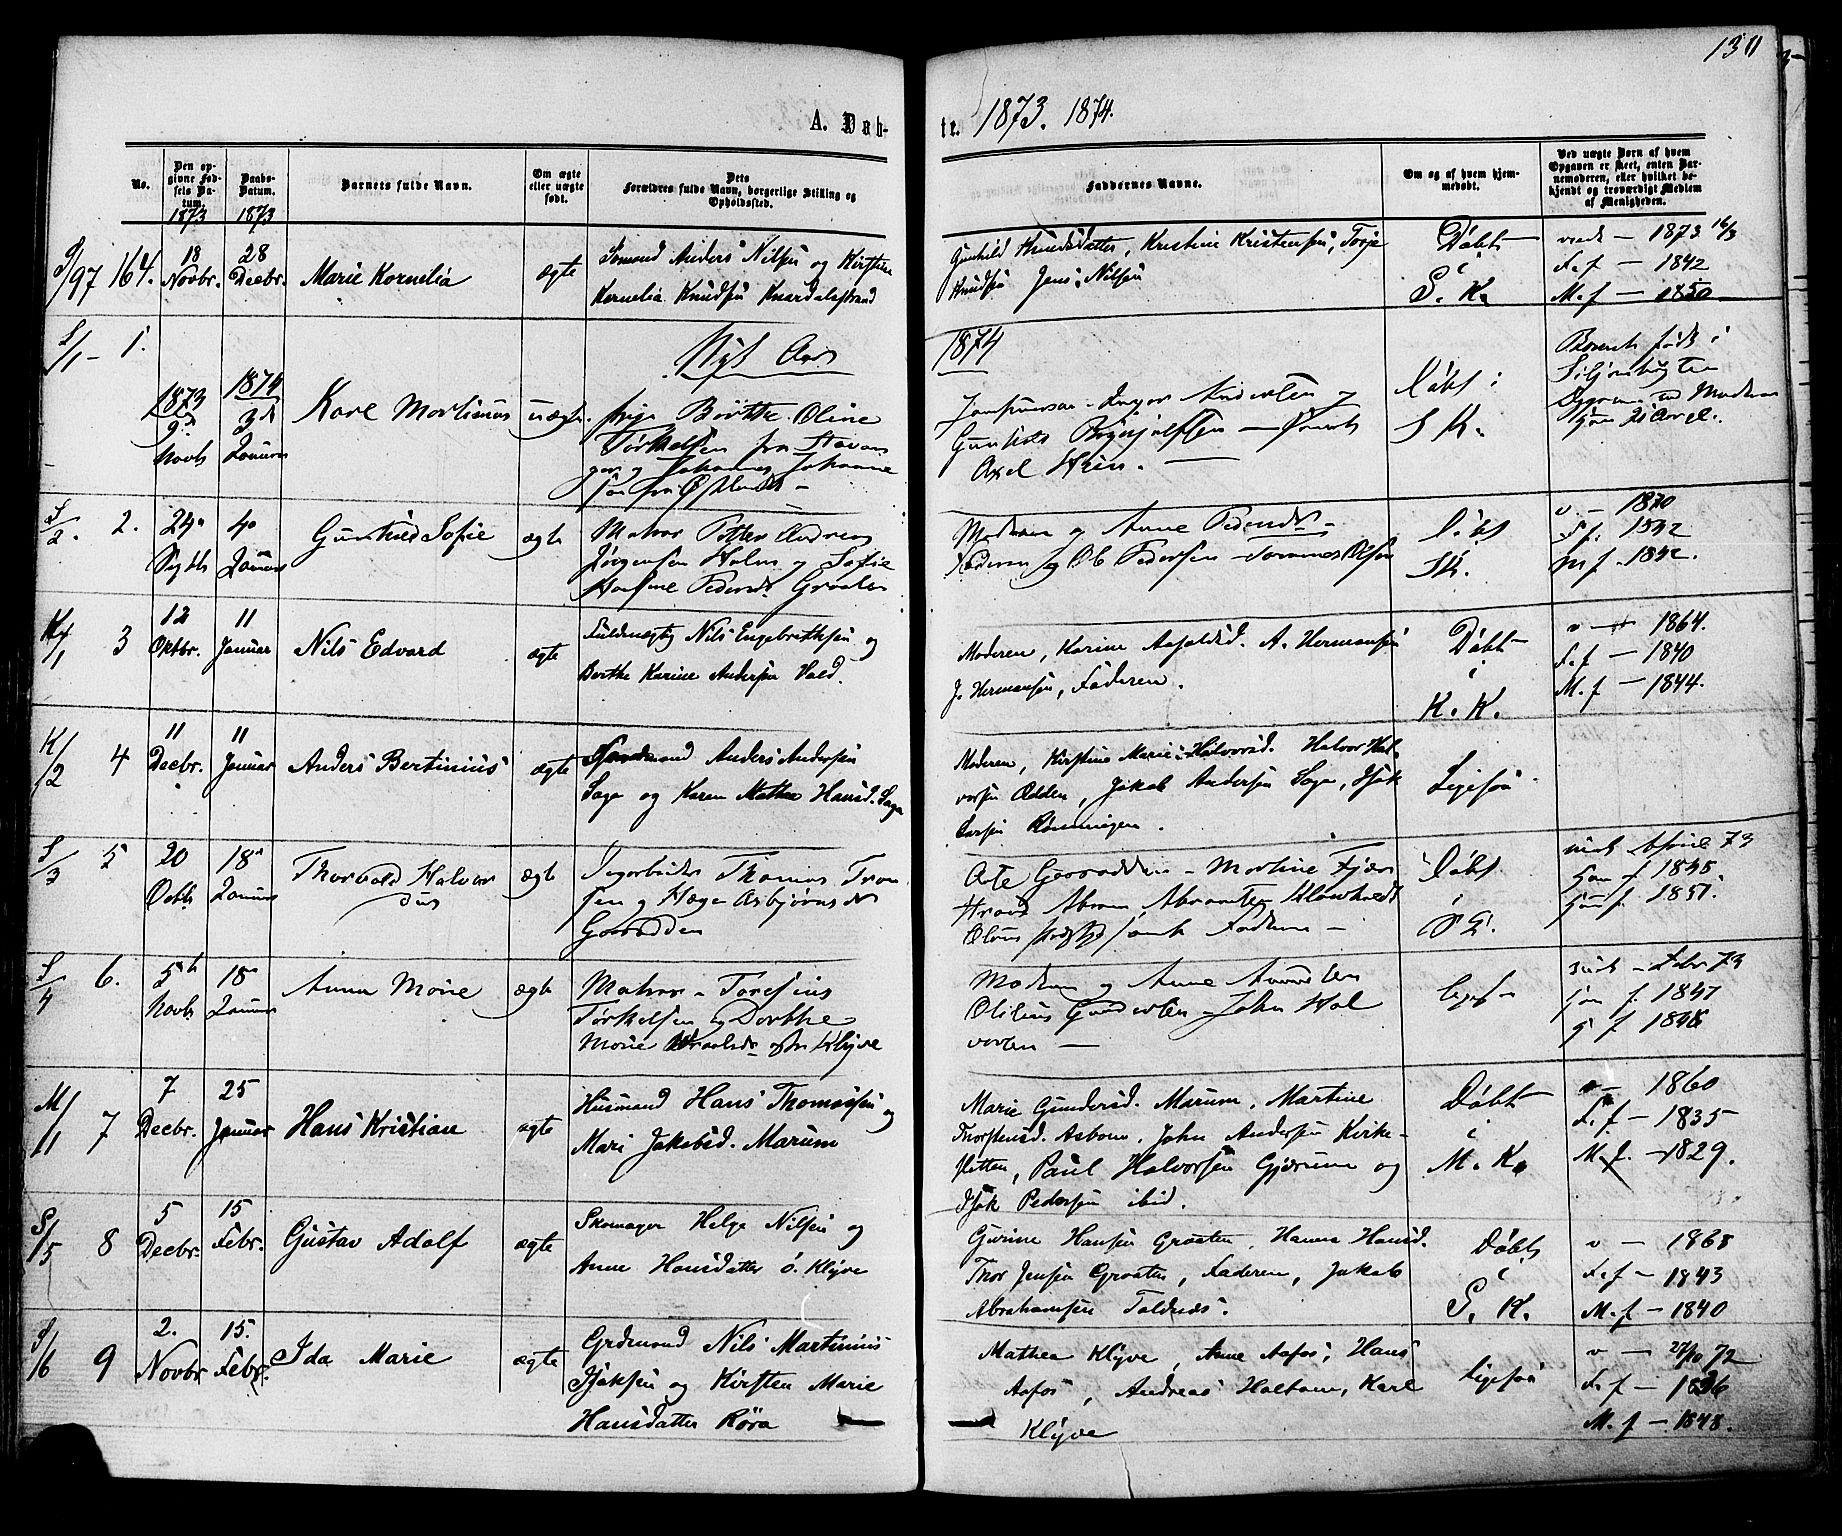 SAKO, Solum kirkebøker, F/Fa/L0008: Ministerialbok nr. I 8, 1865-1876, s. 130